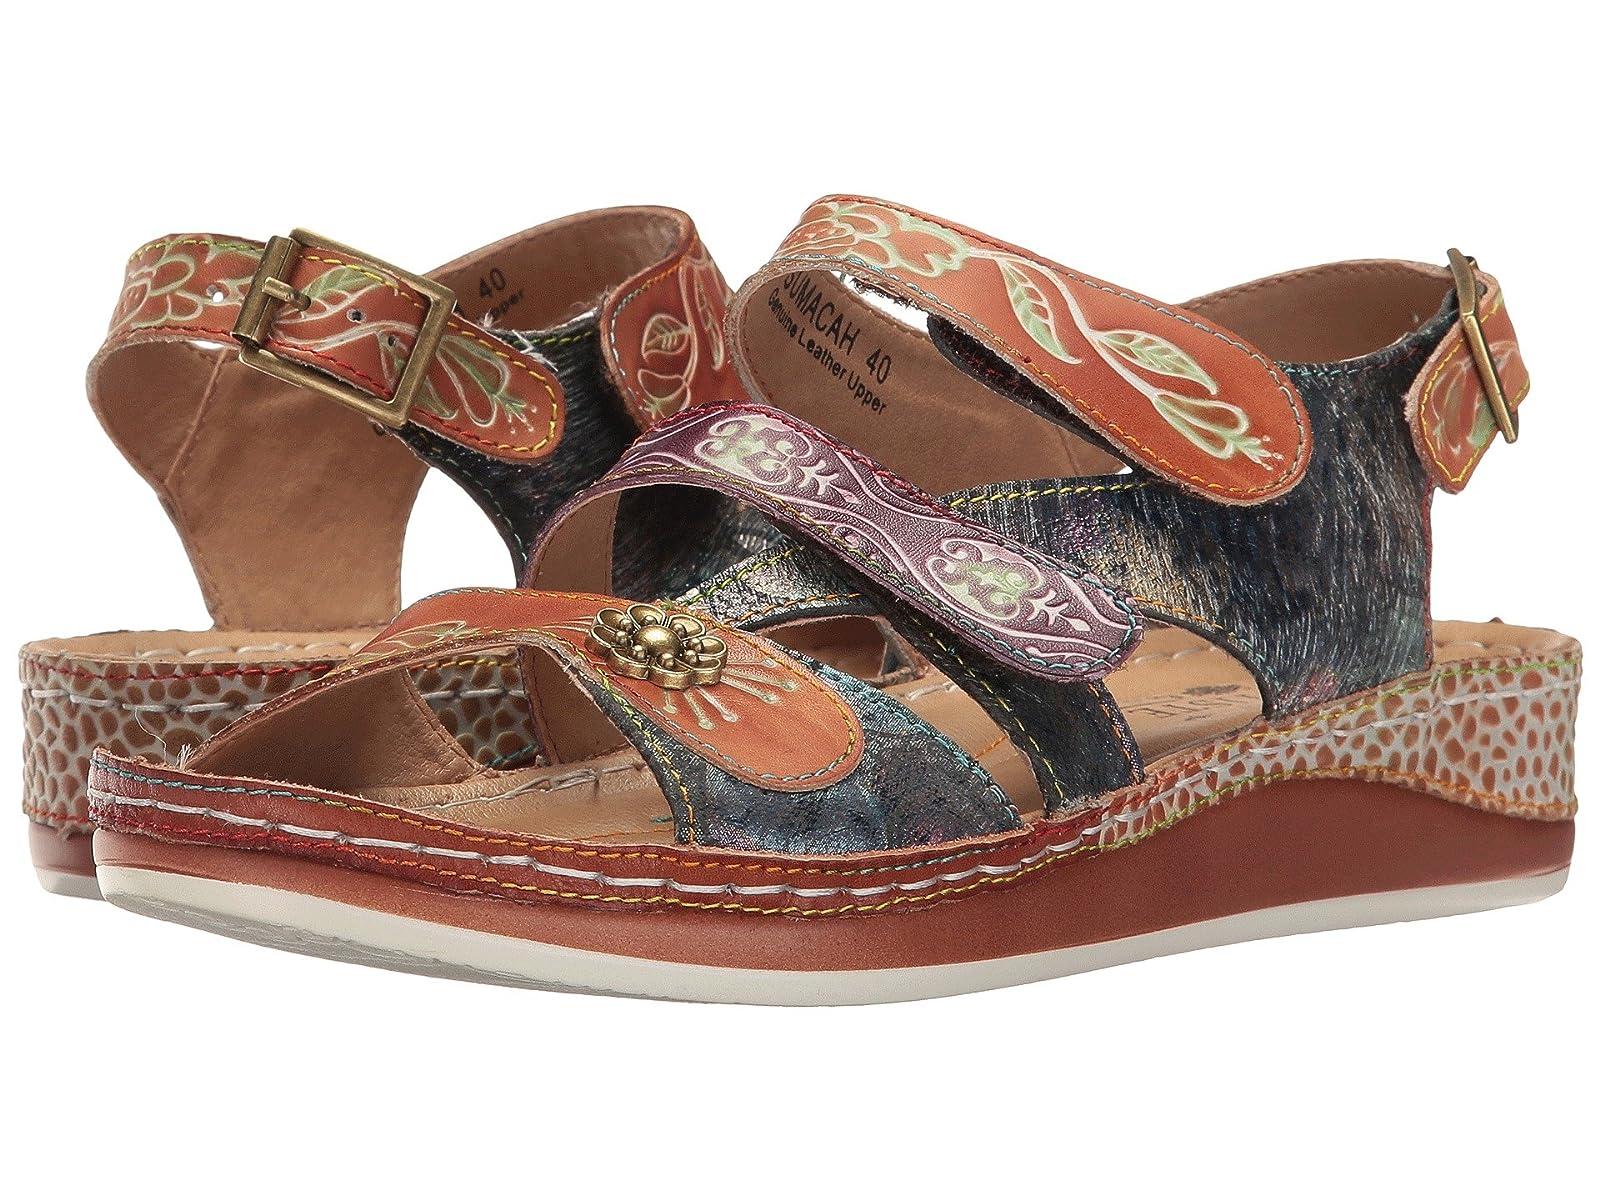 L'Artiste by Spring Step SumacahAtmospheric grades have affordable shoes